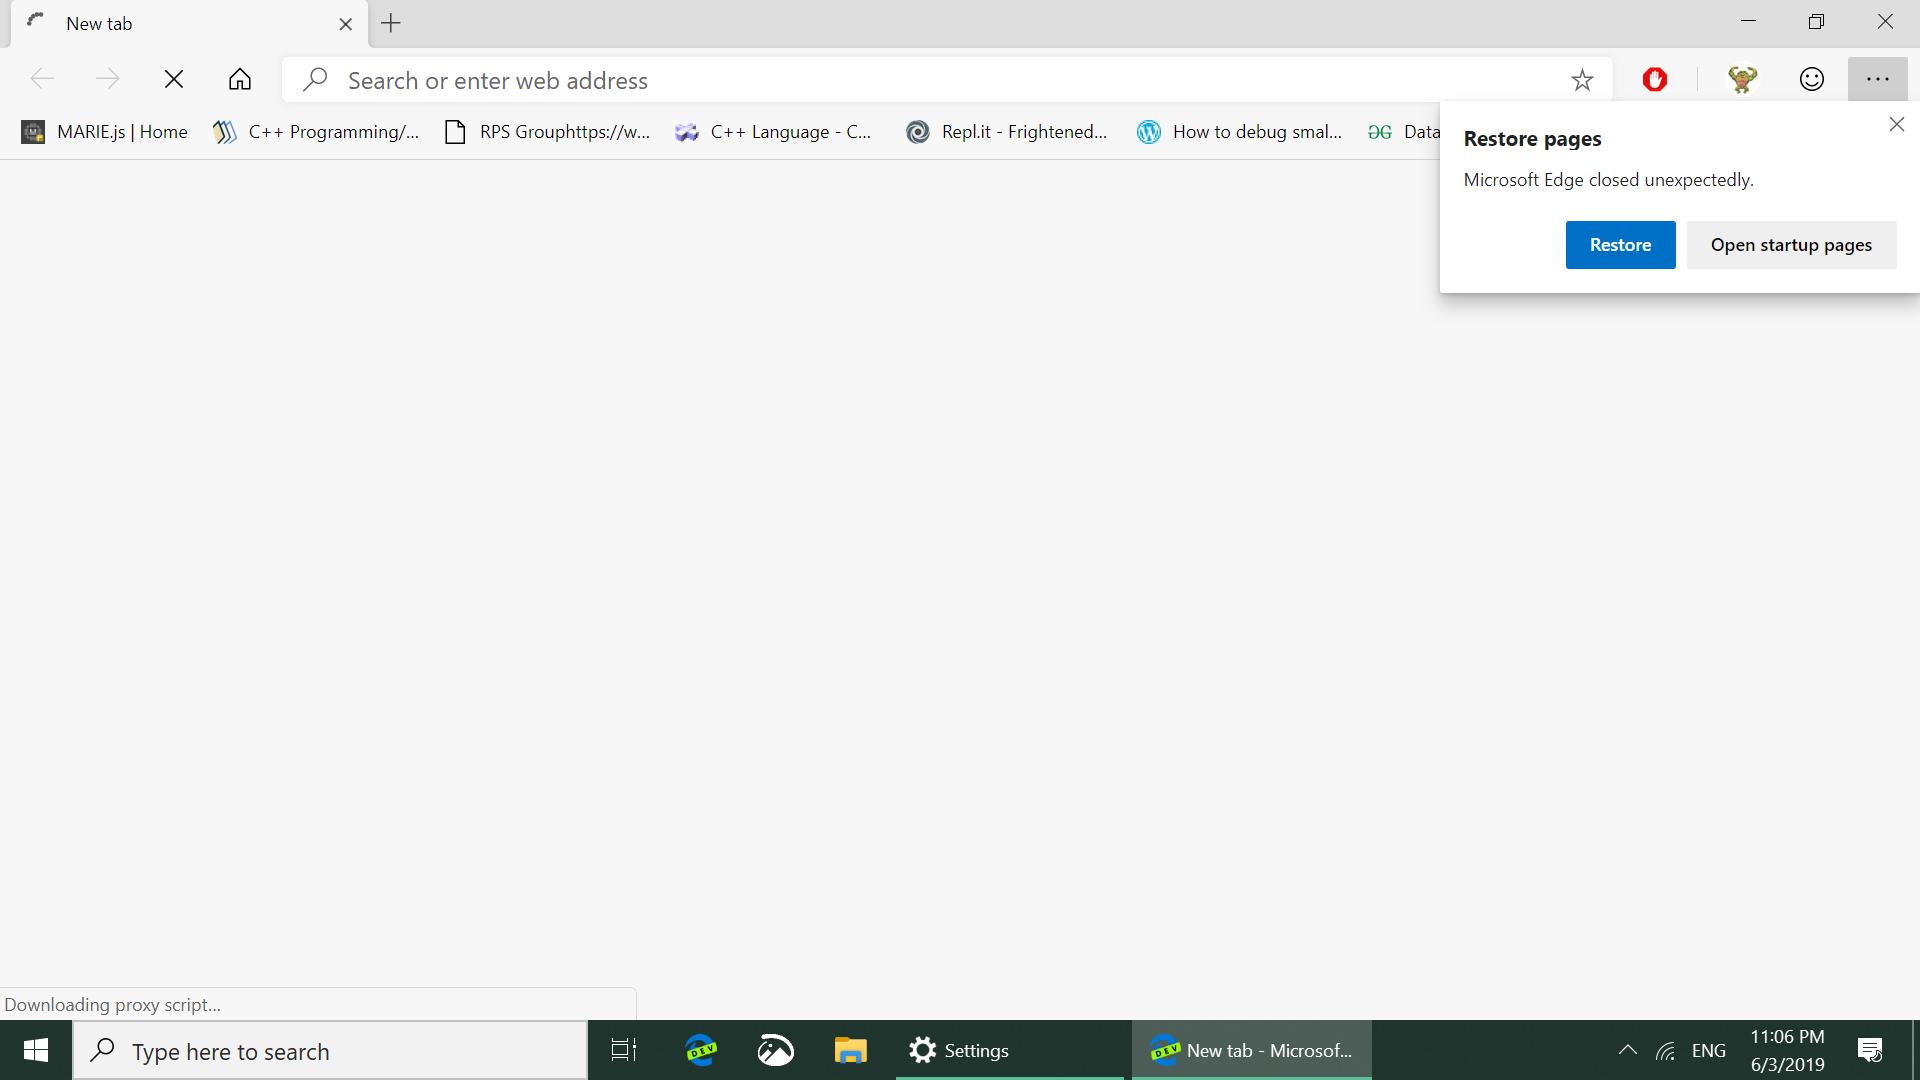 MS Edge Chromium bookmark keep crashing on startup (Need to